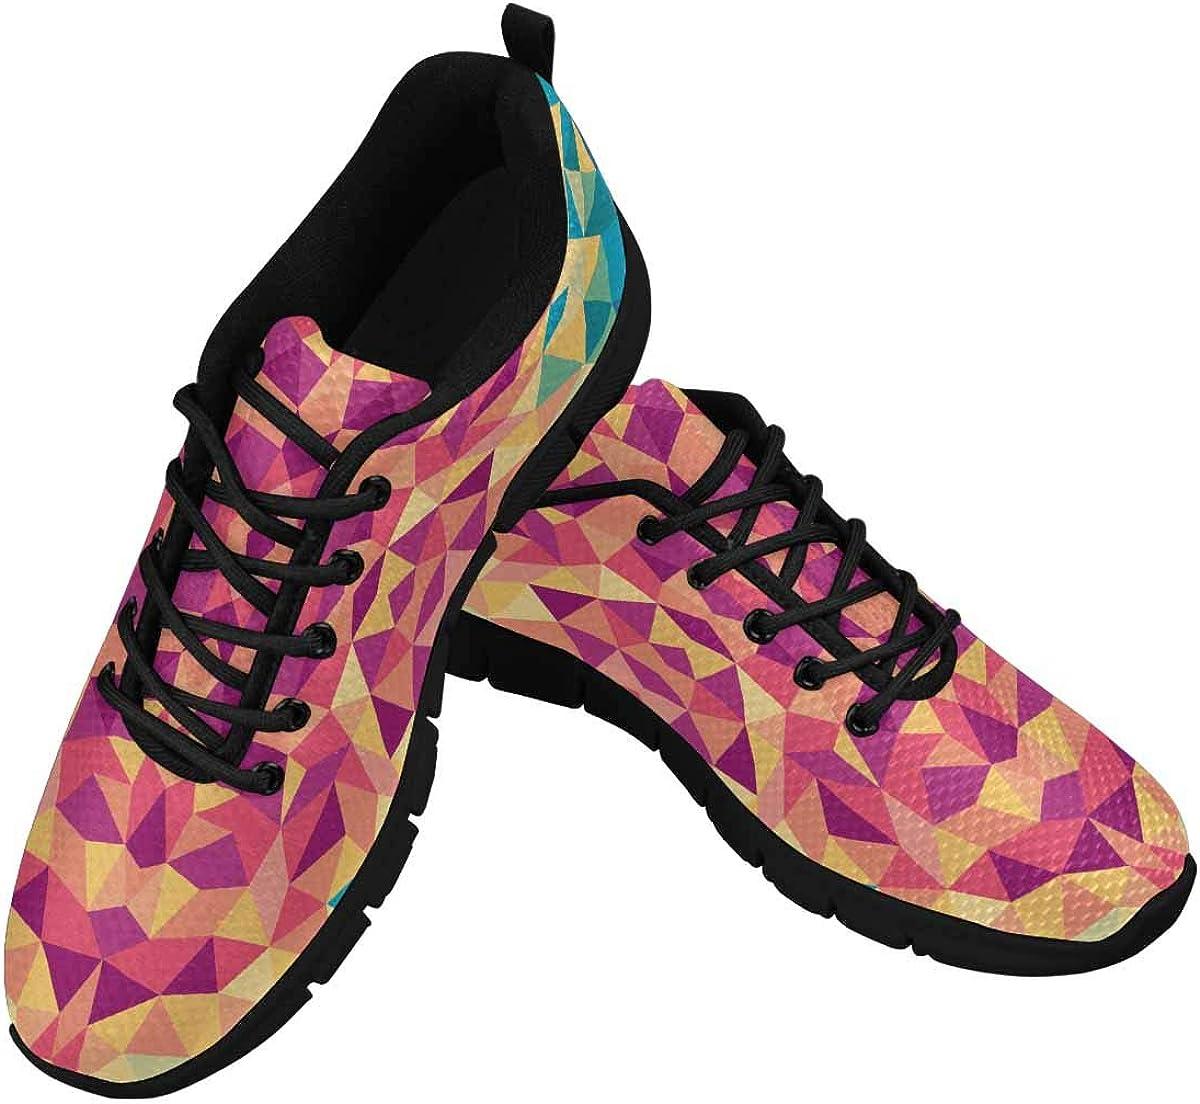 InterestPrint Multicolored Geometric Design Women's Breathable Non Slip Sneakers